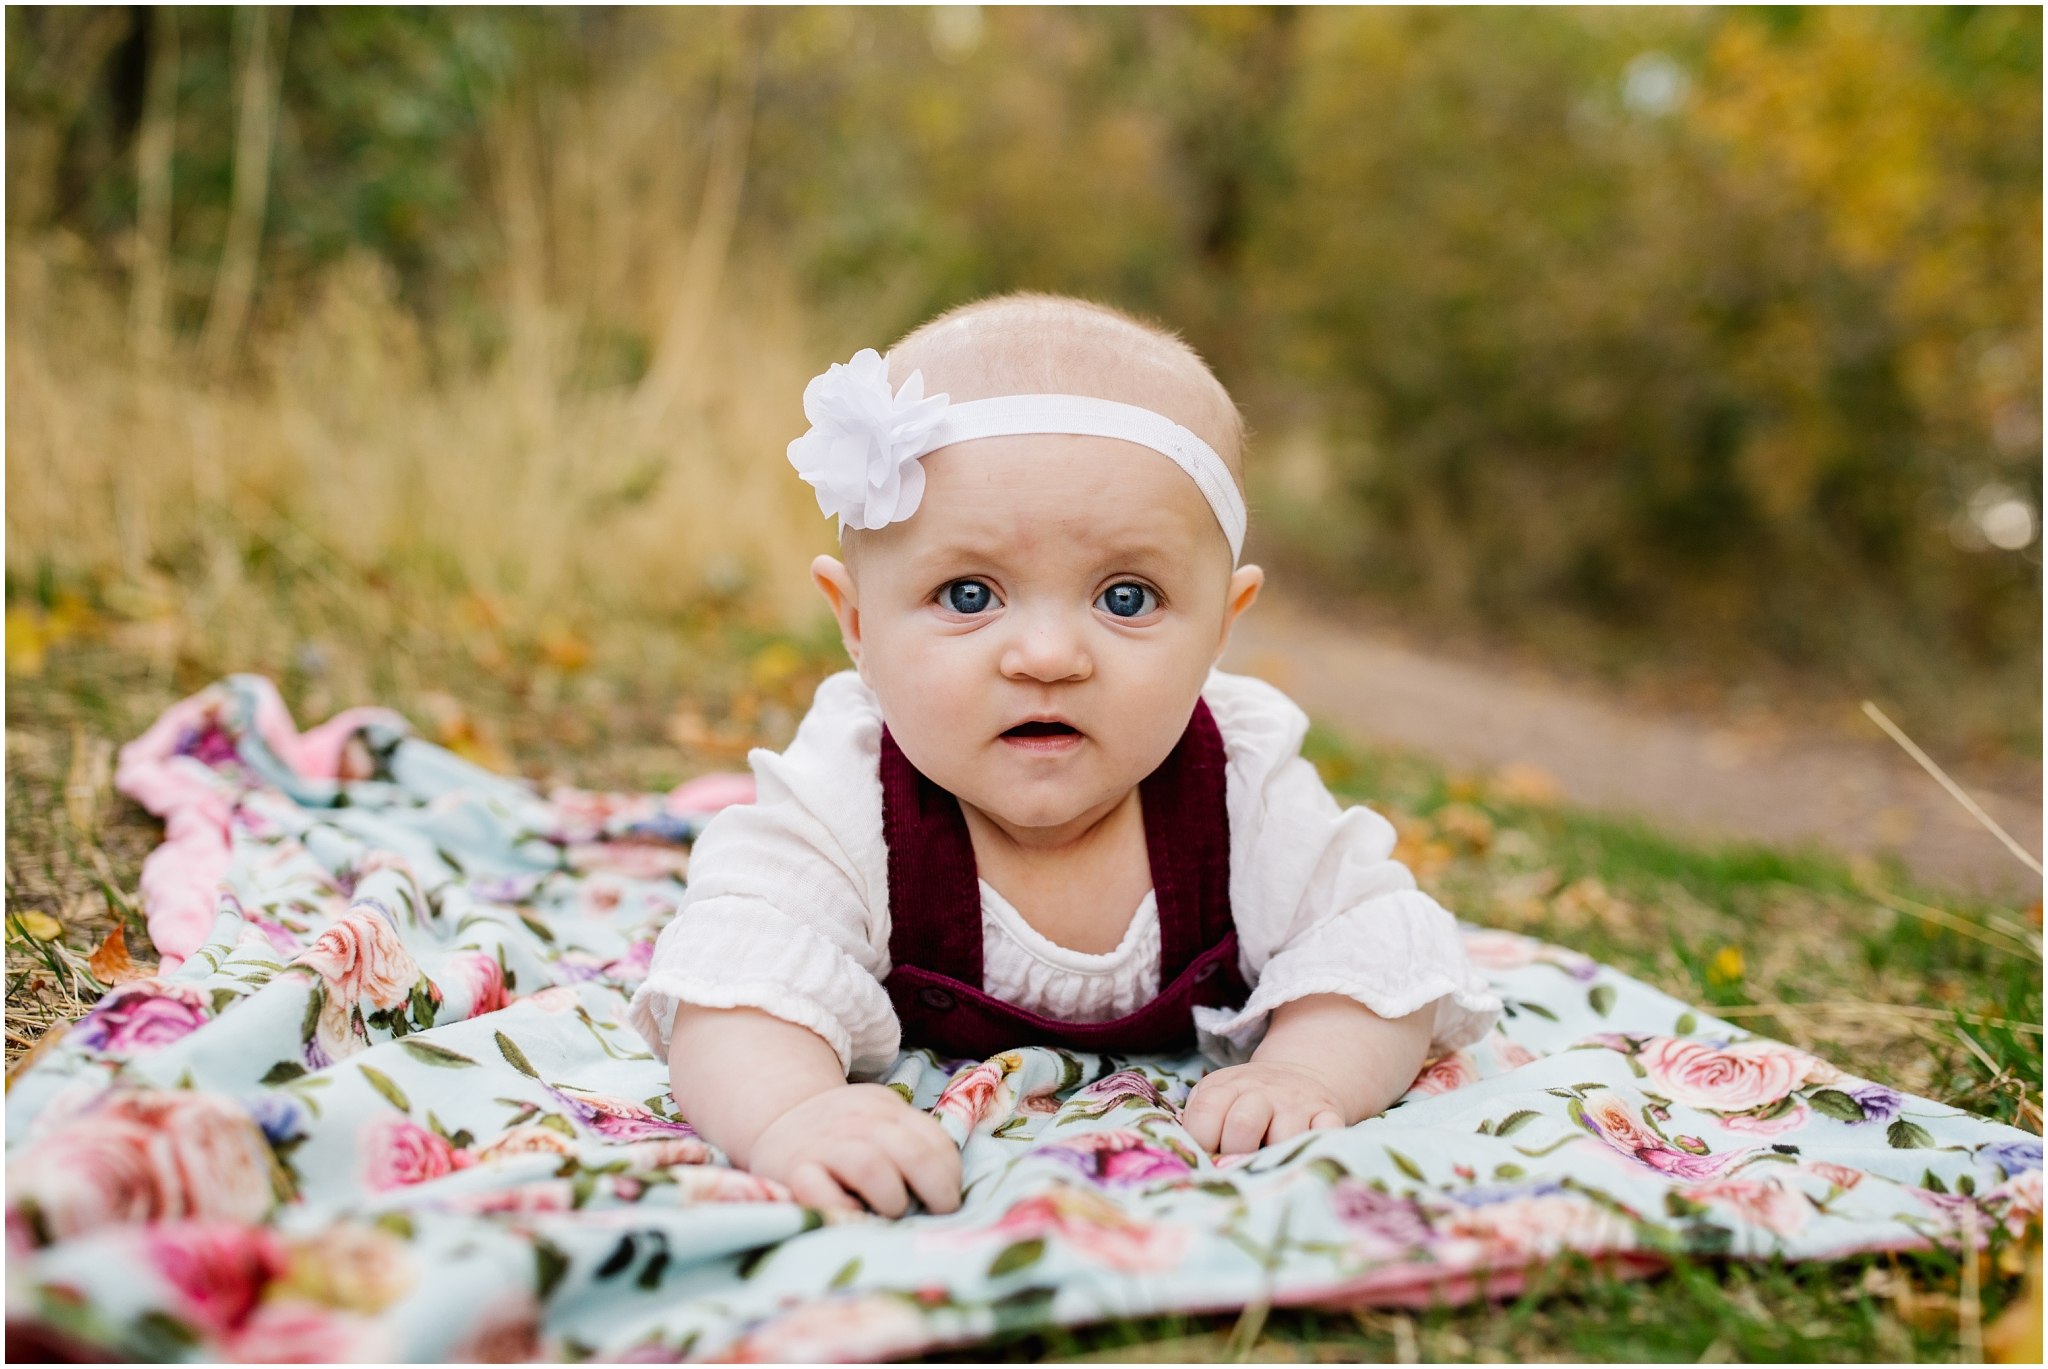 Matthews-62_Lizzie-B-Imagery-Utah-Family-Photographer-Central-Utah-Photographer-Utah-County-Nephi-Utah.jpg